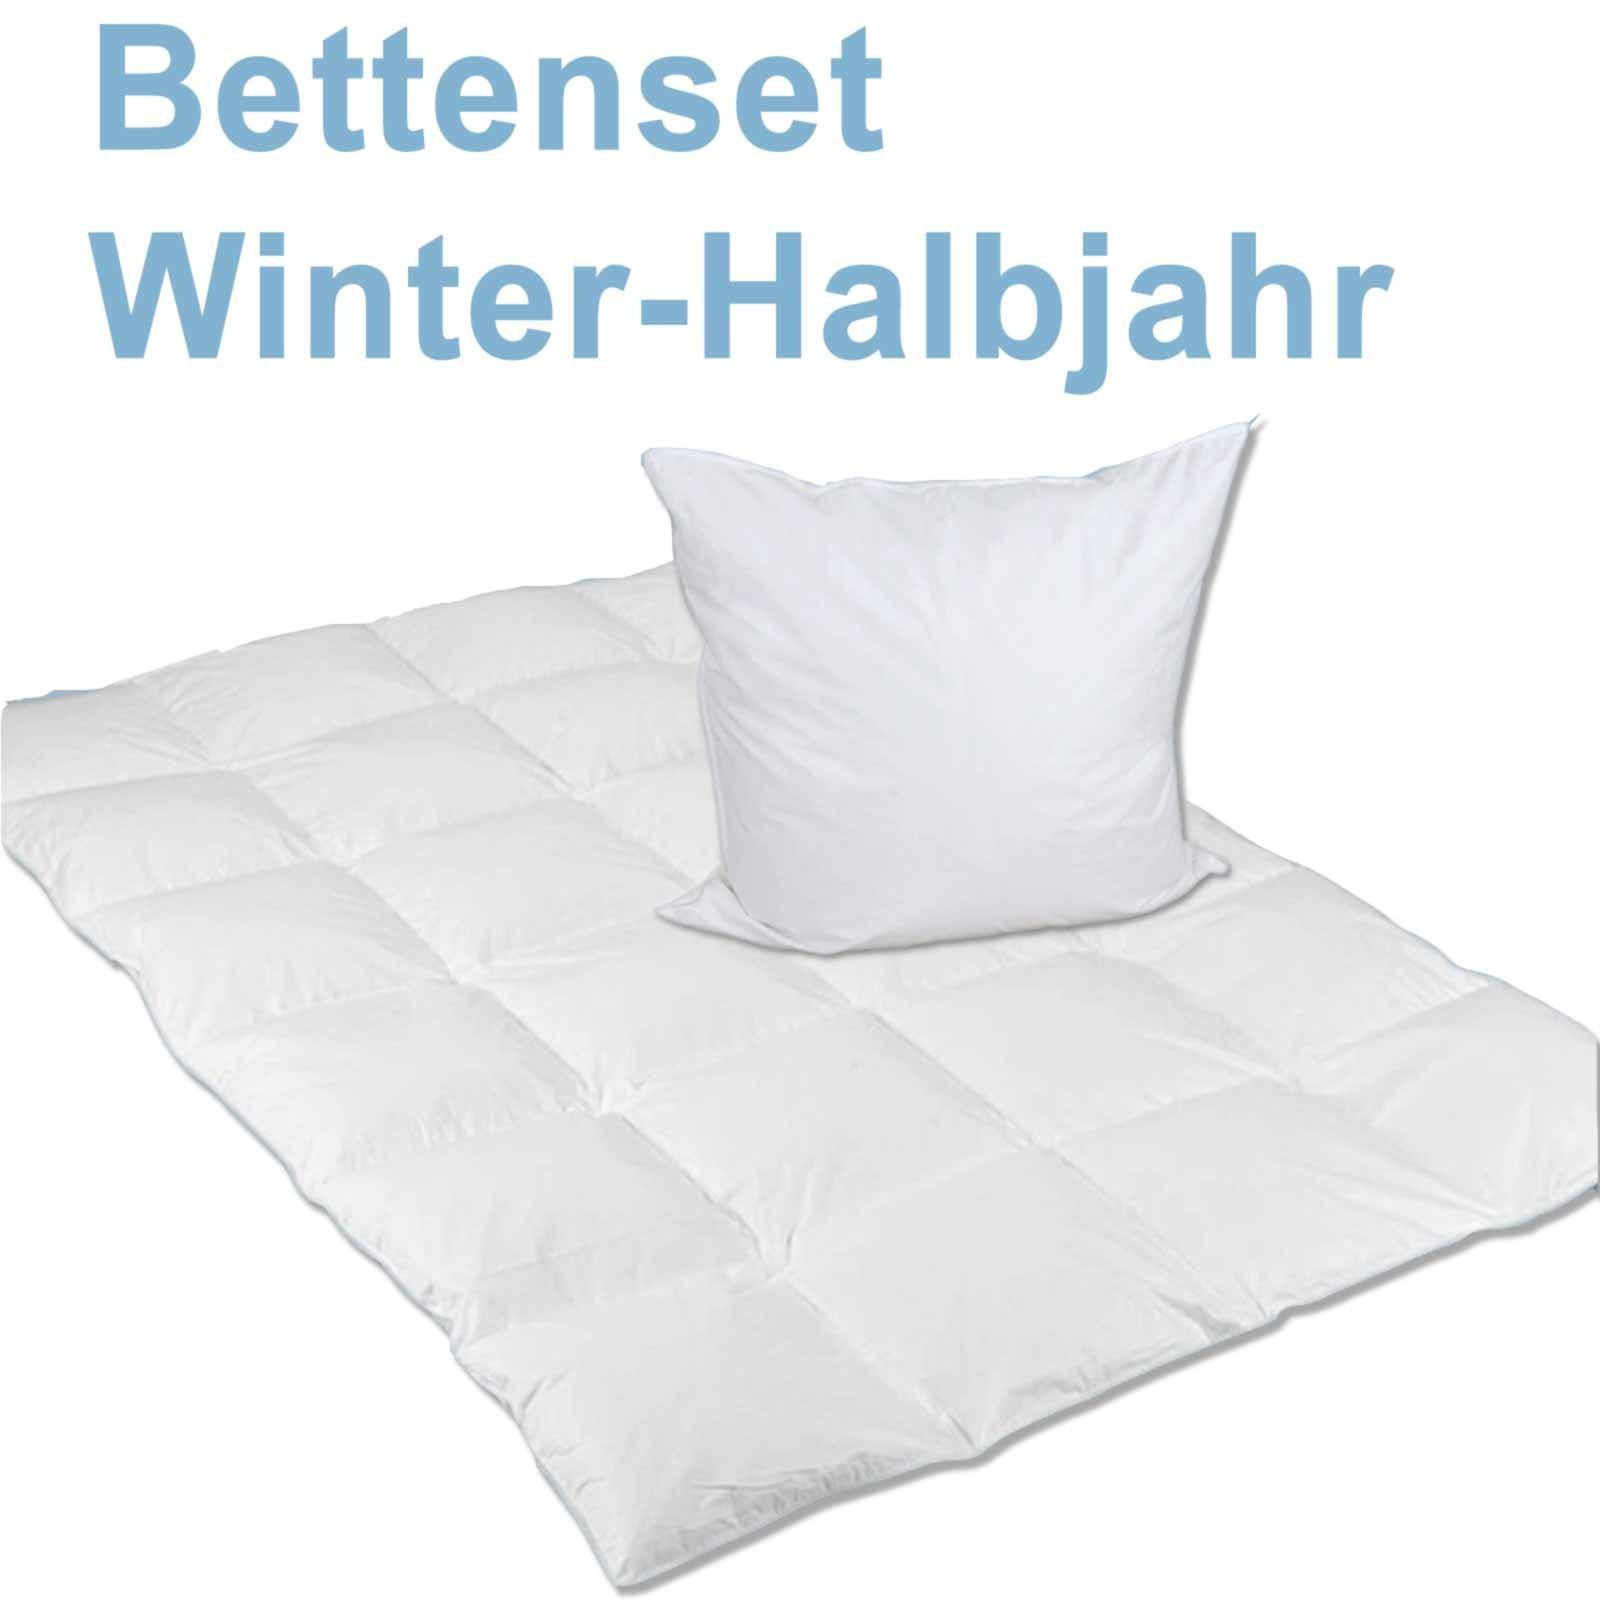 nset Winterhalbjahr 100% Daunen - HW46001HW80800